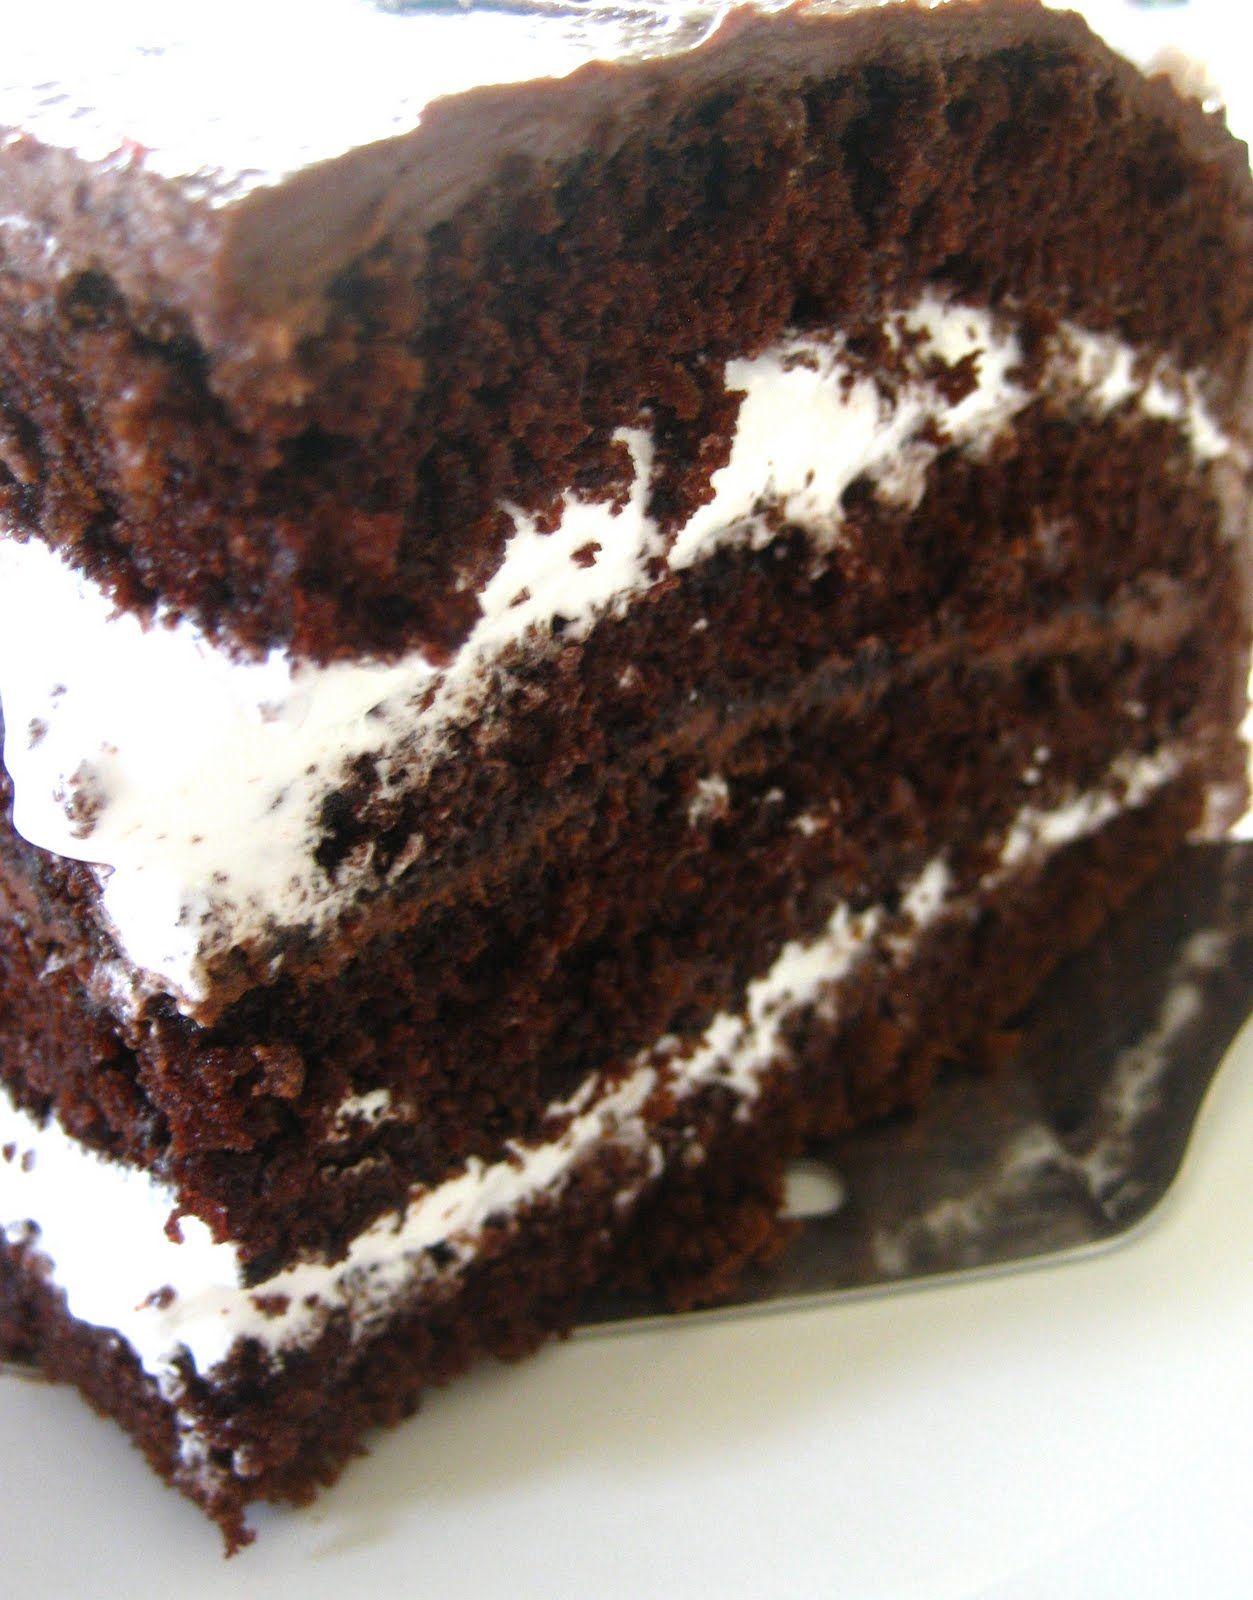 Carmel And Chocolate Little Debbie Cake